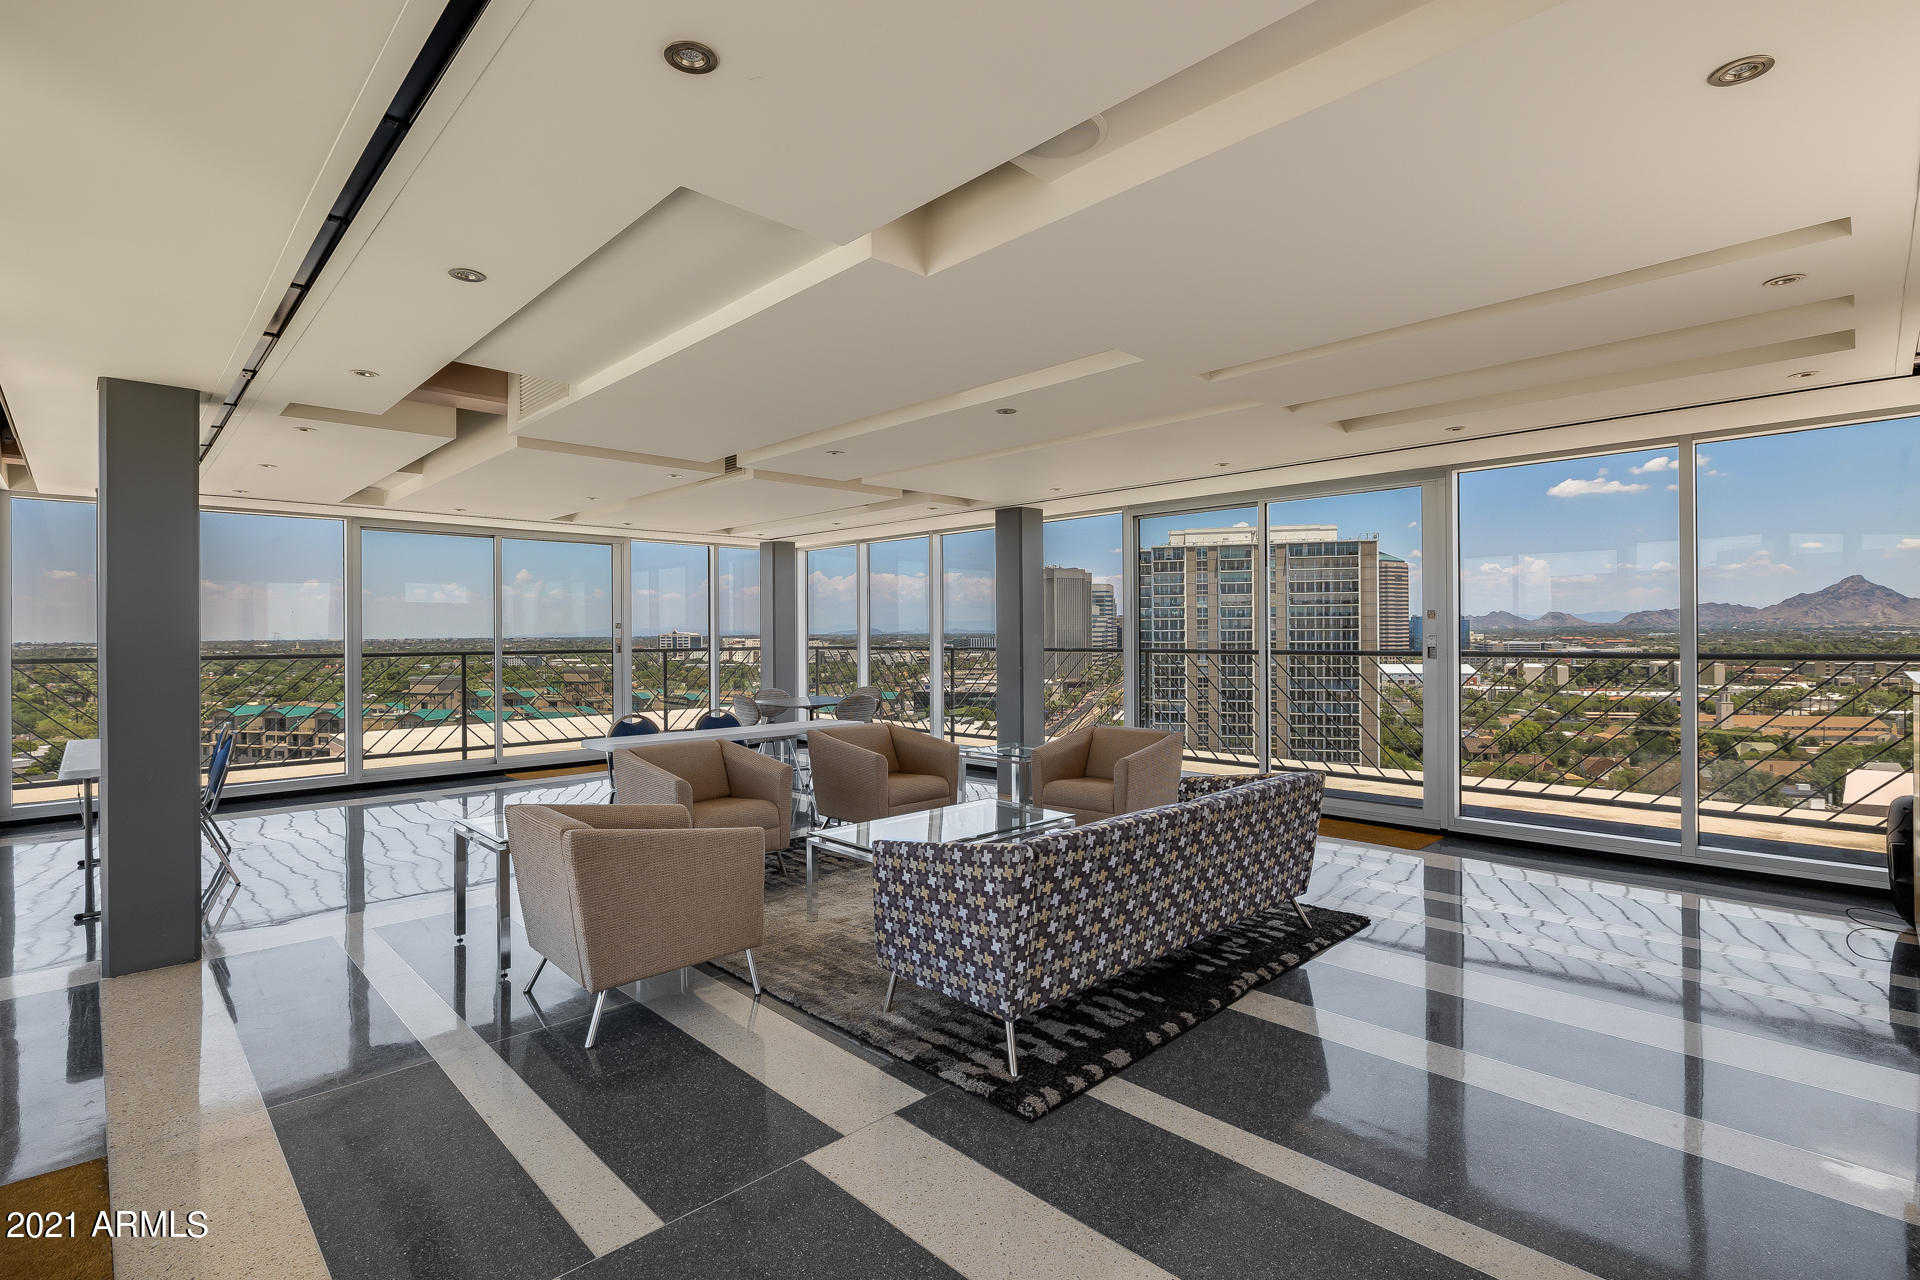 $349,000 - 2Br/2Ba -  for Sale in Phoenix Towers Los Olivos 55-60, Phoenix